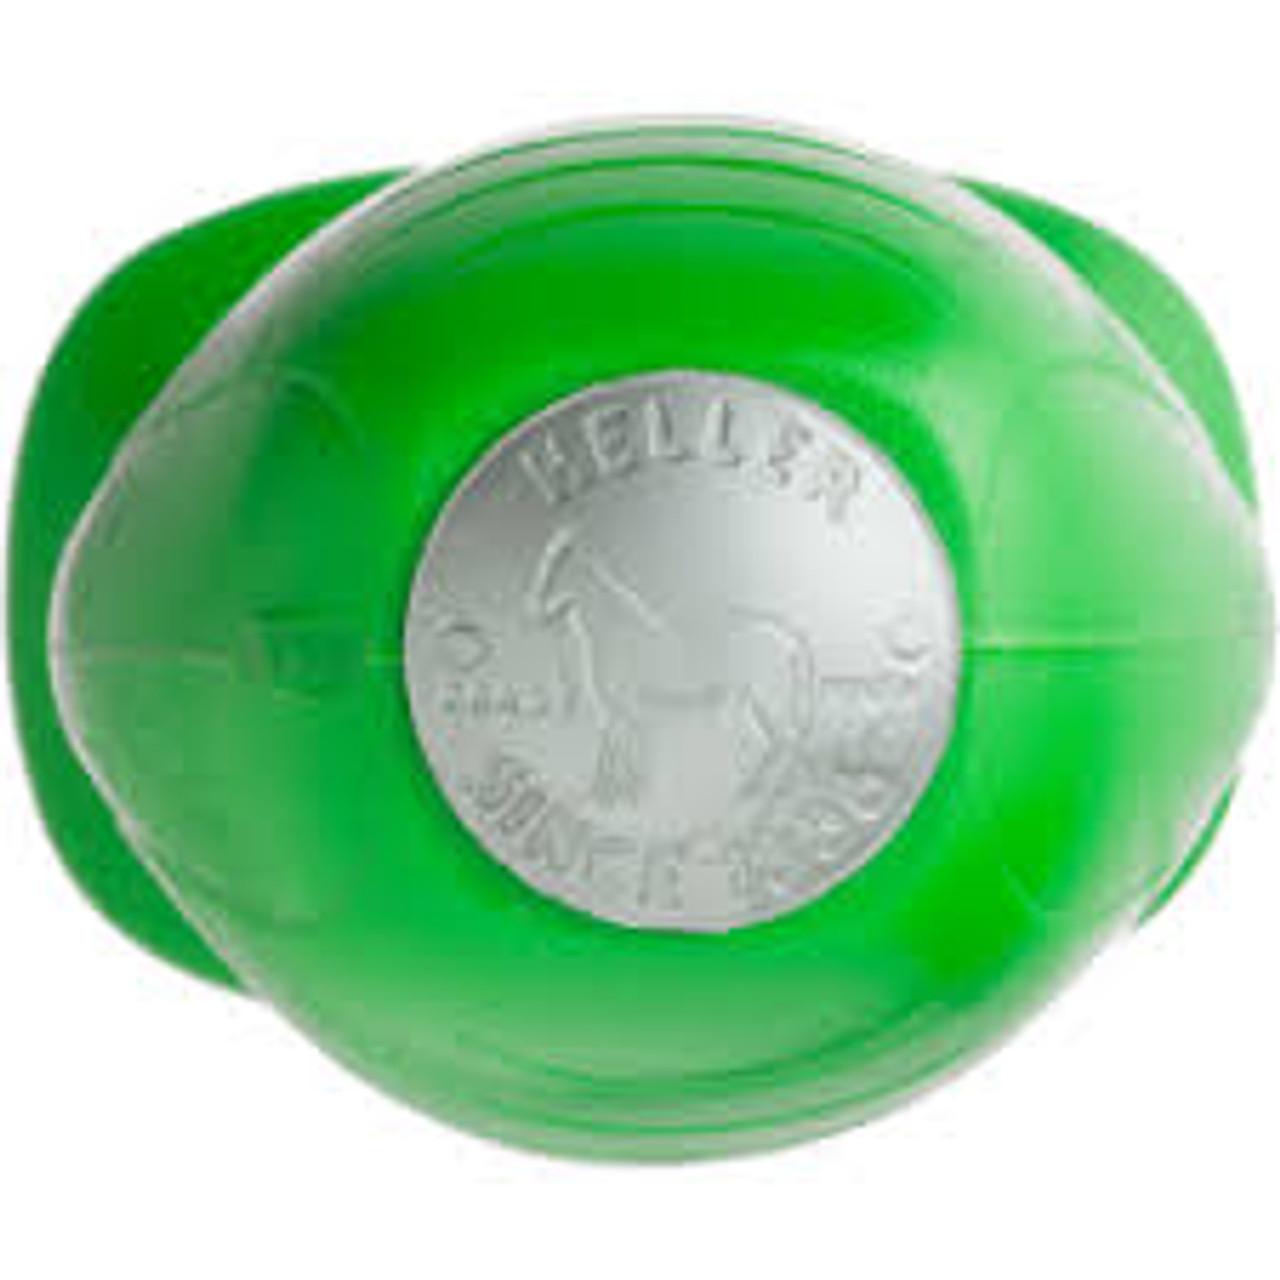 Heller GRIP eXcel Rasp Handle Green